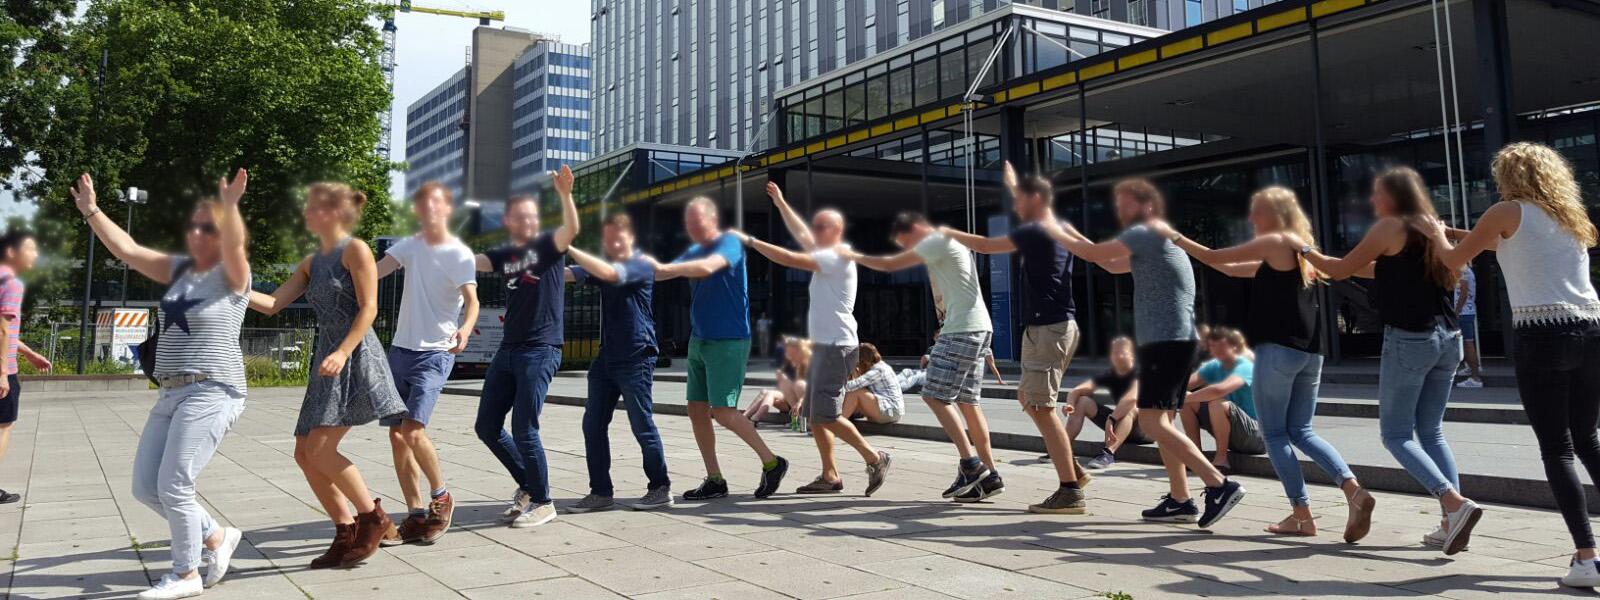 polonaise city game fun